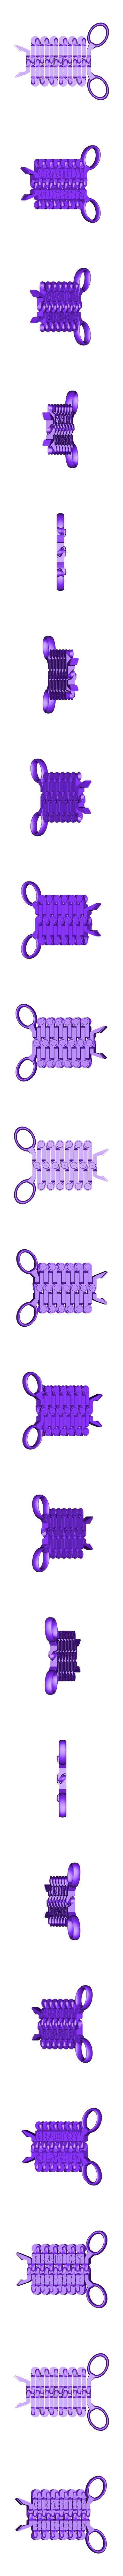 GrabToyInfinite_6frames_slack05.stl Download free STL file Grab Toy Infinite • 3D printing model, ecoiras